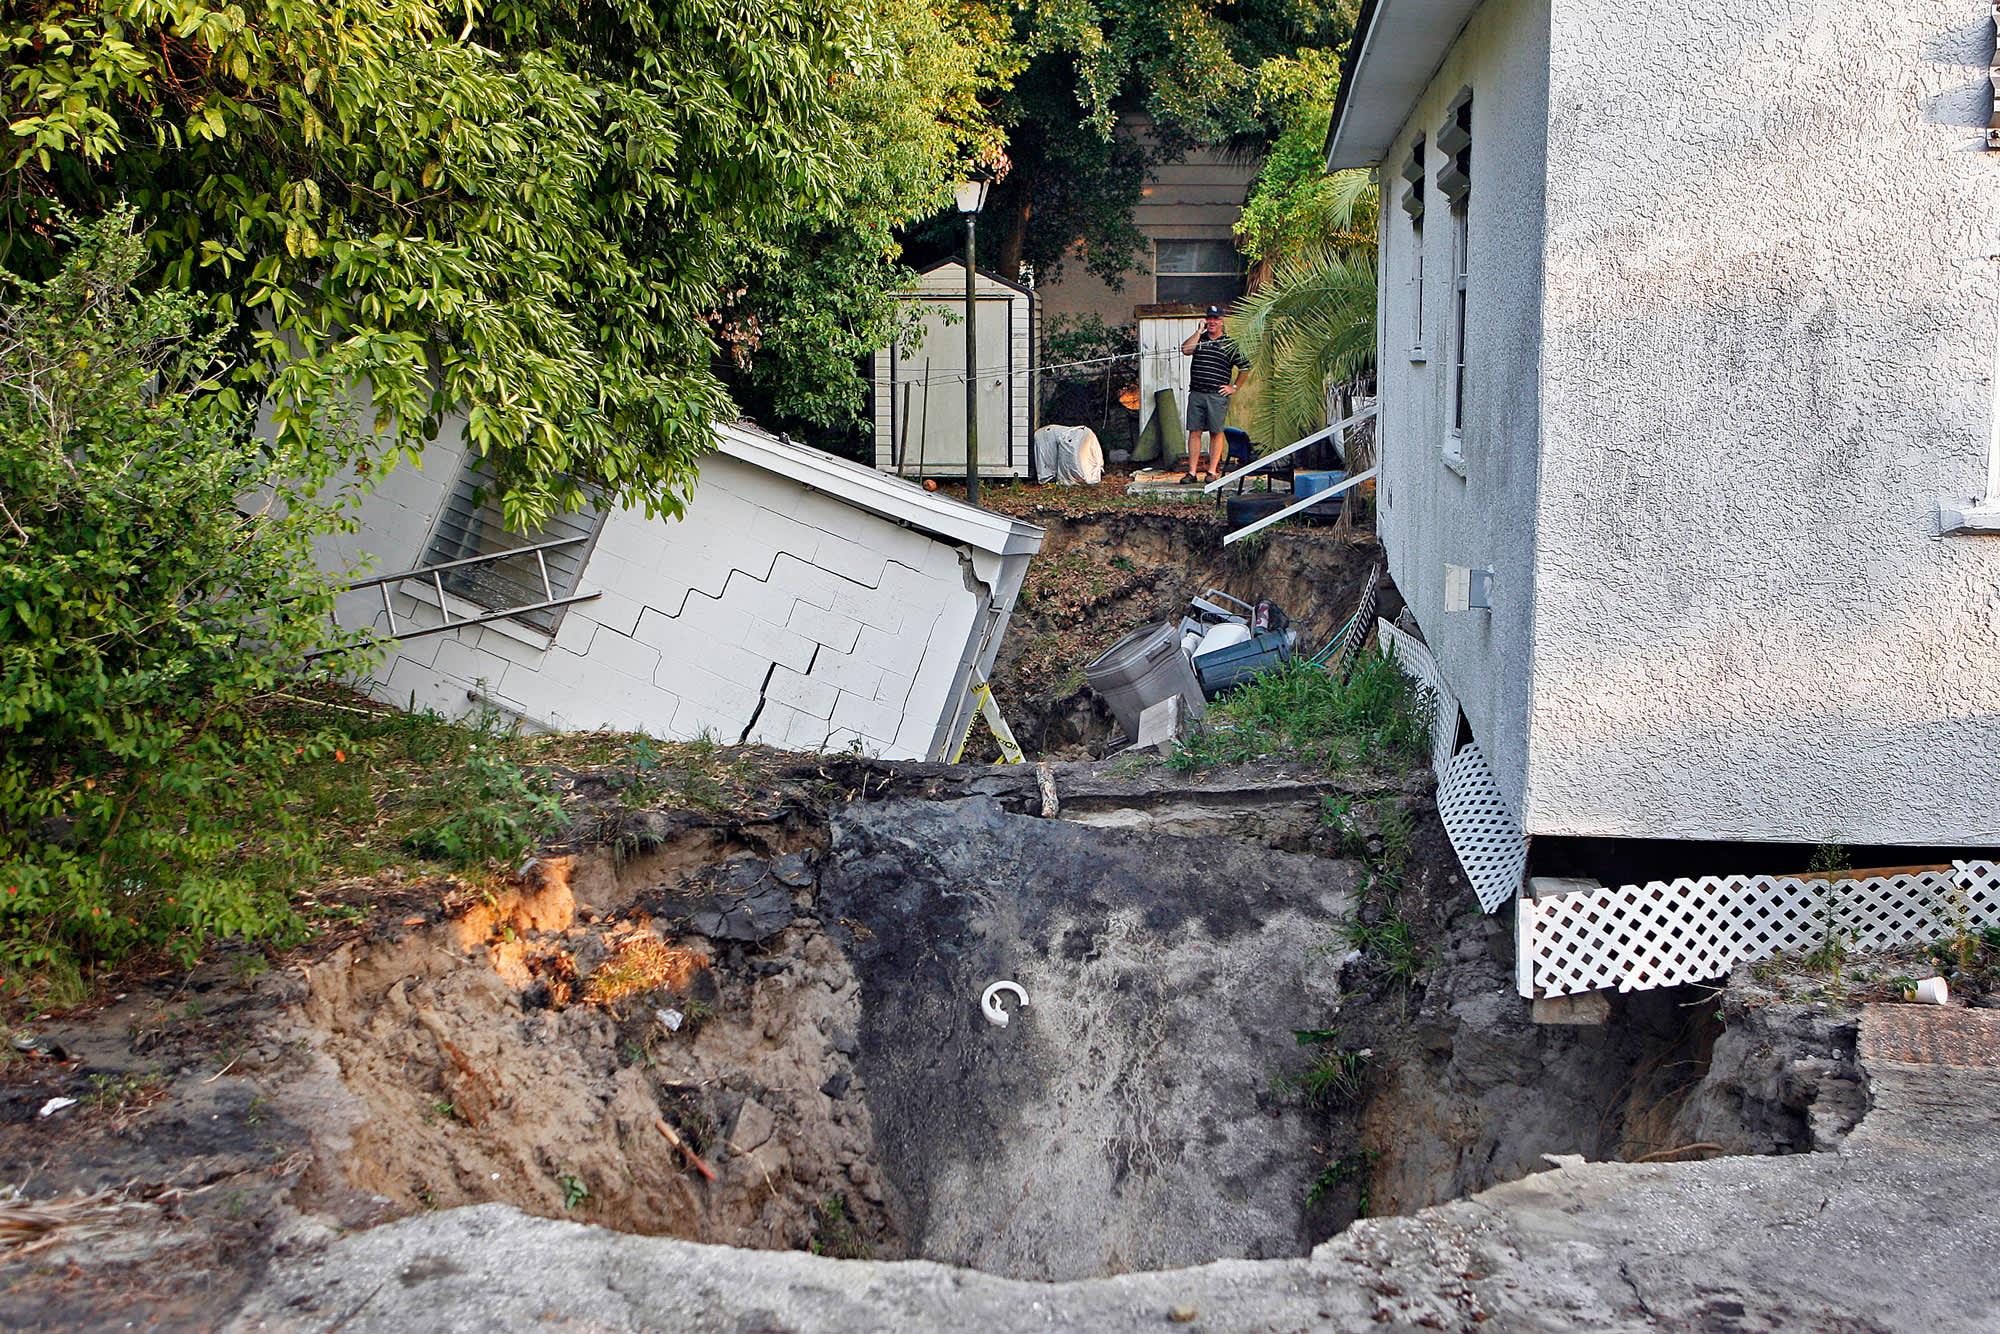 overdevelopment widens florida sinkhole problem